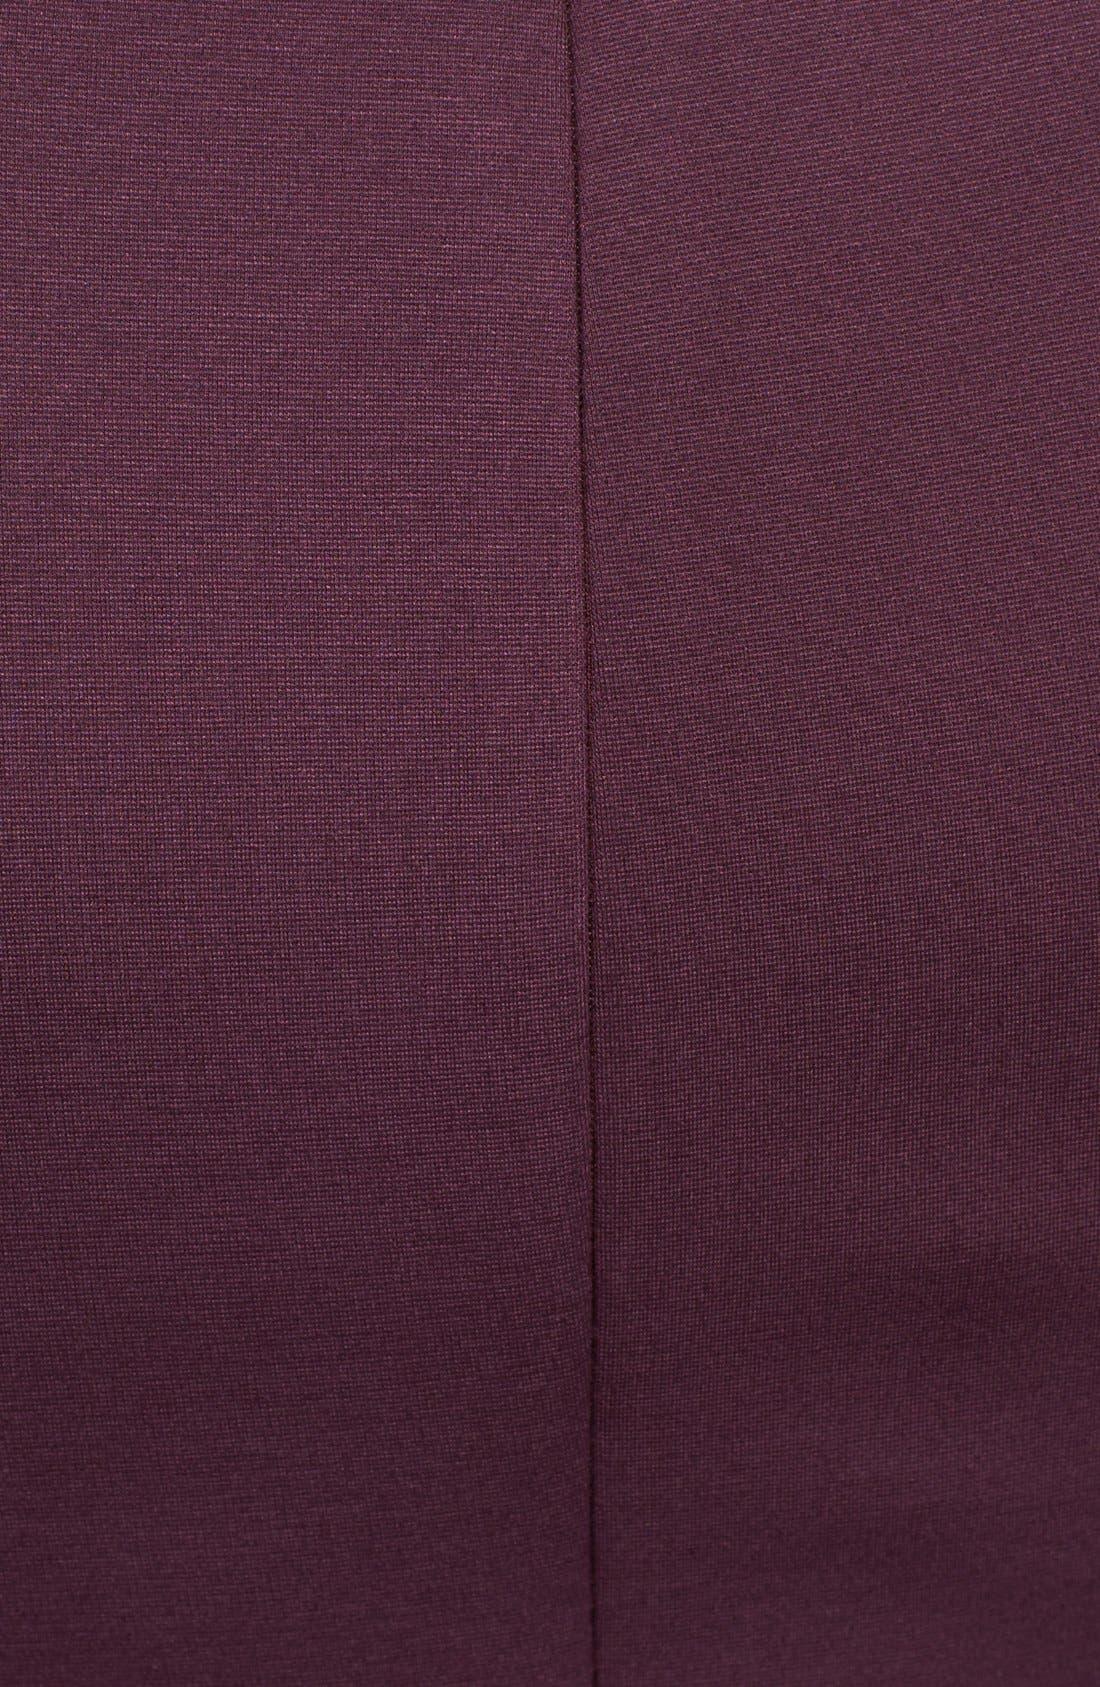 Alternate Image 3  - Trina Turk 'Fenella' Ponte Sheath Dress